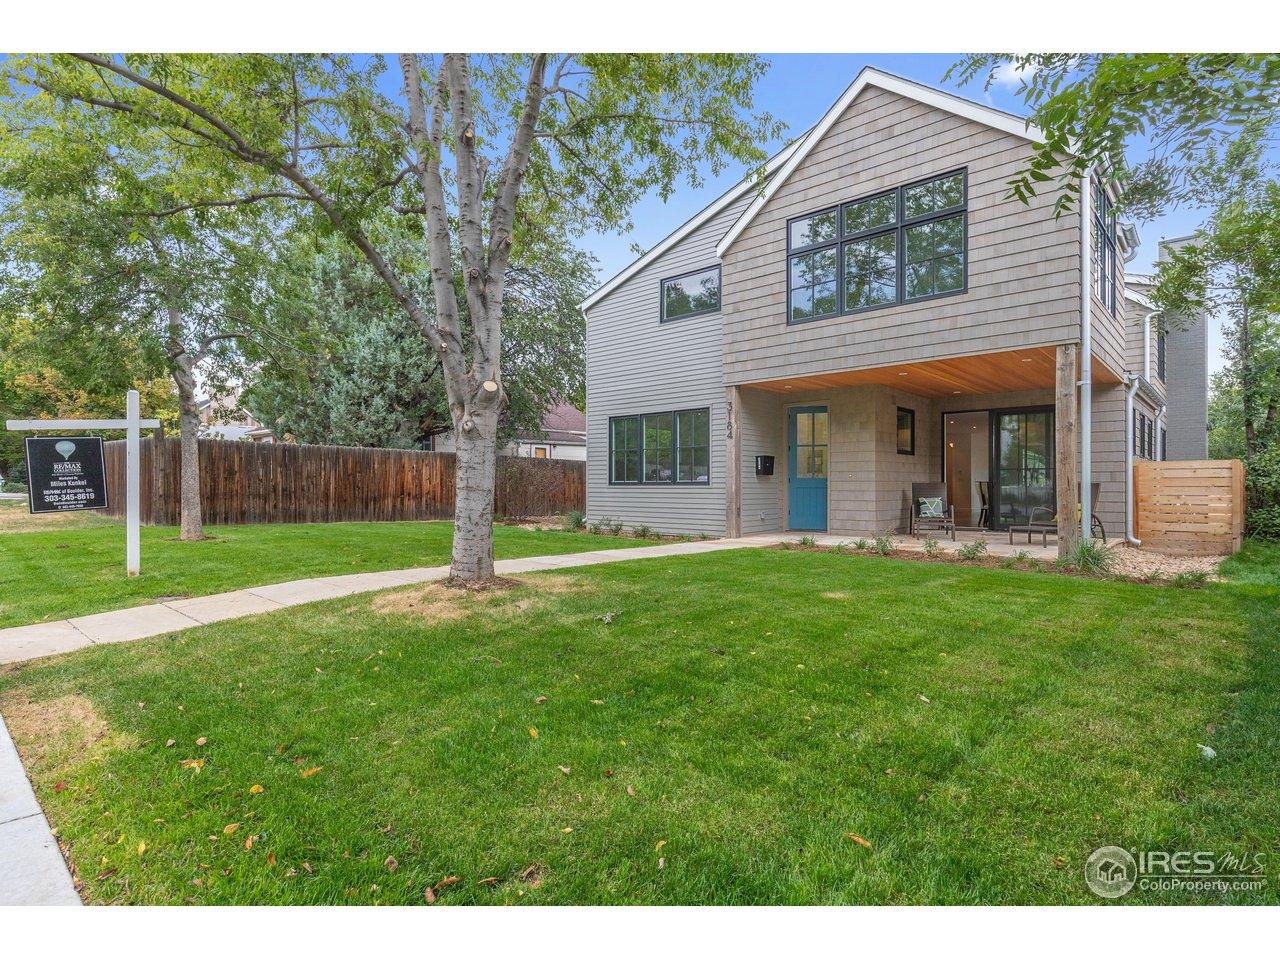 3184 9th St, Boulder CO 80304